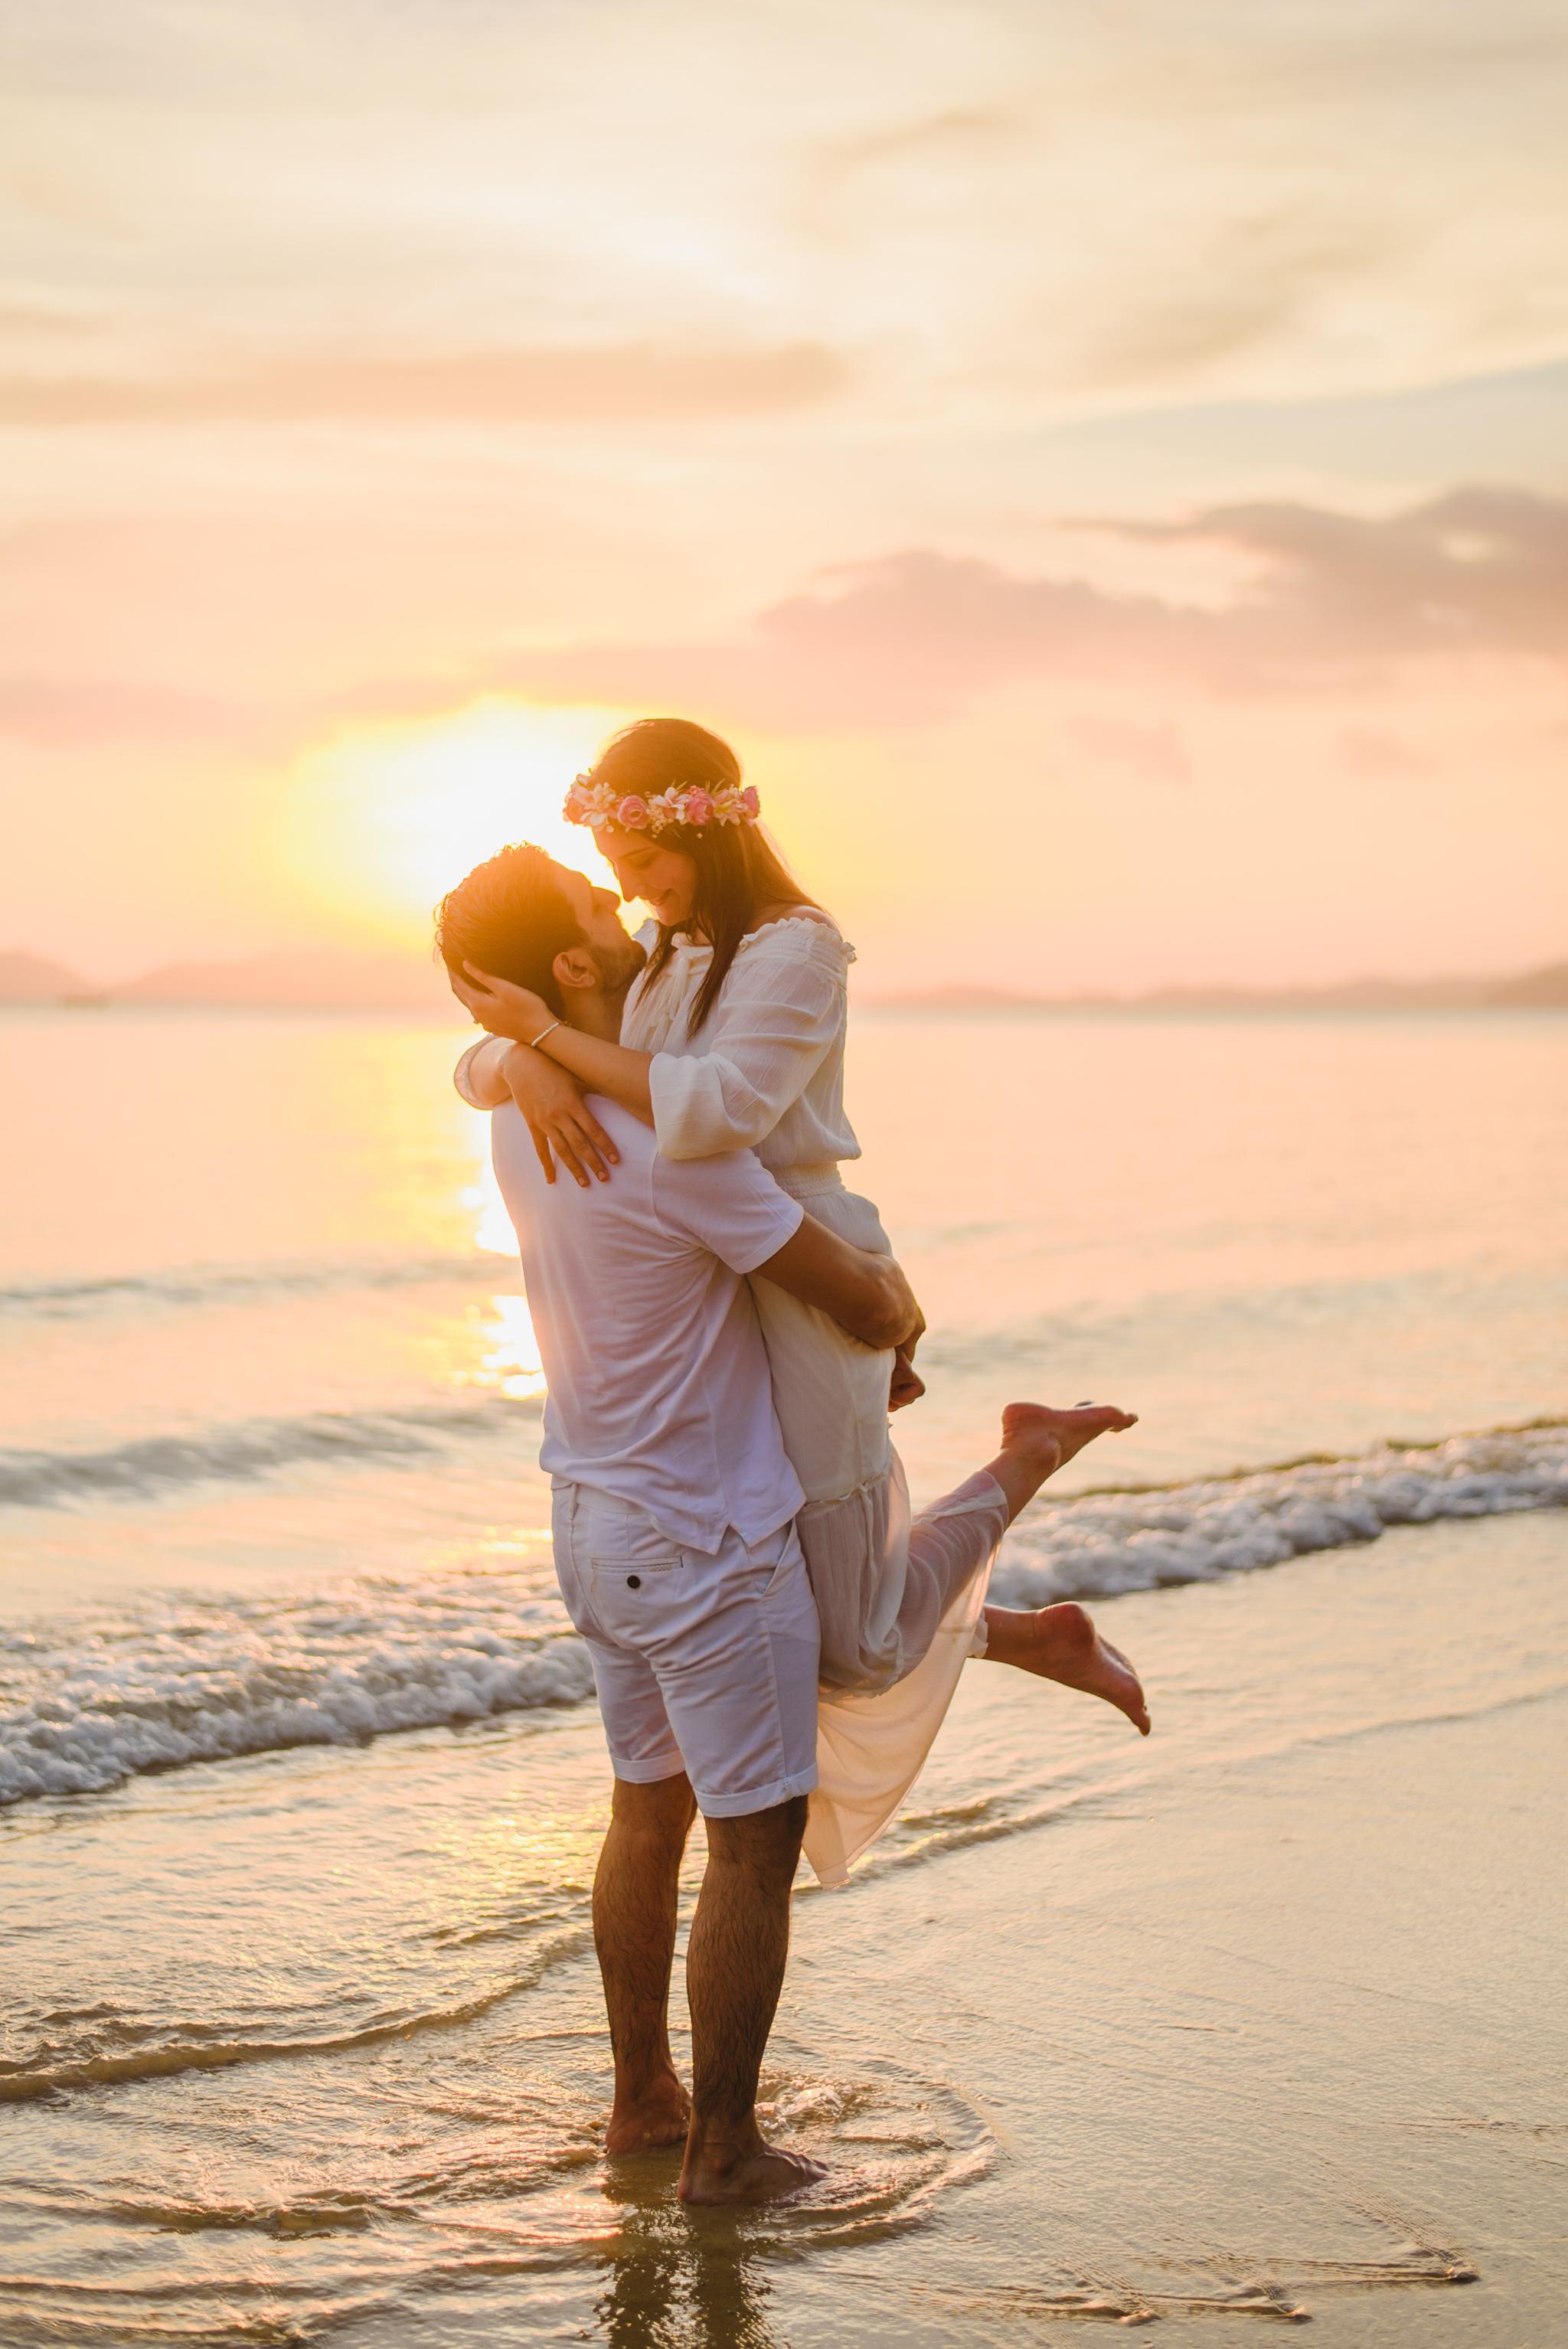 Honeymoon photography in Krabi